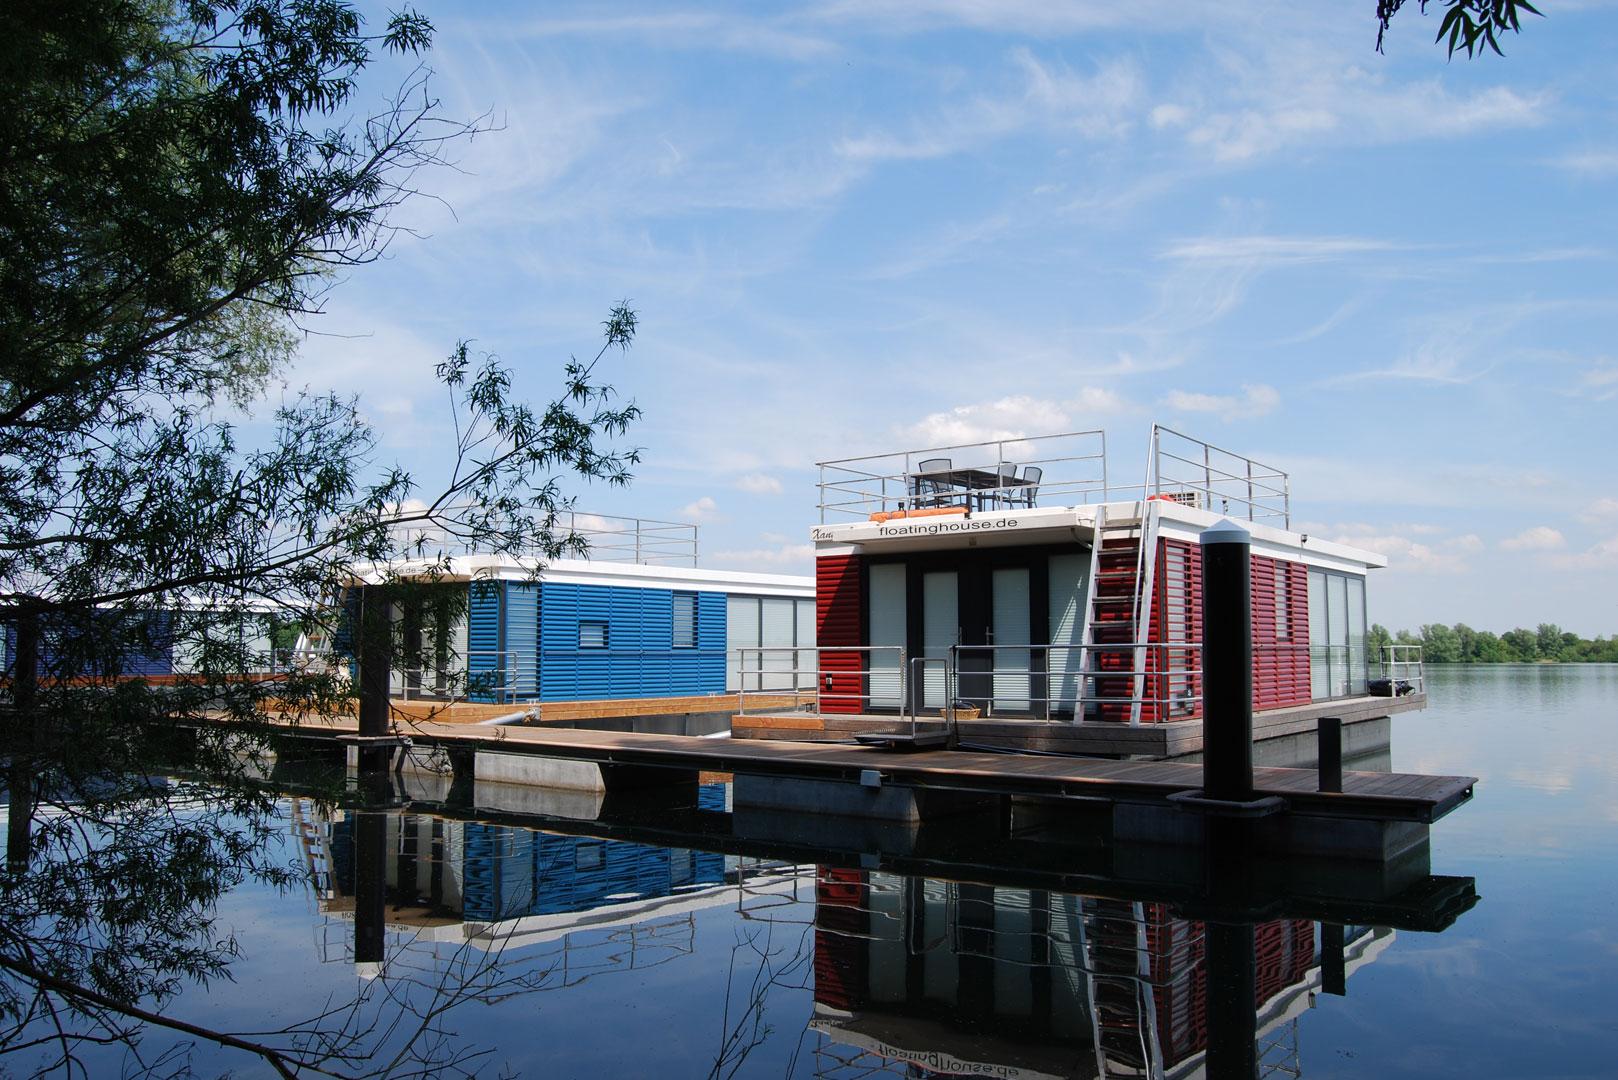 hausboote in xanten kaufen nordrhein westfalen. Black Bedroom Furniture Sets. Home Design Ideas